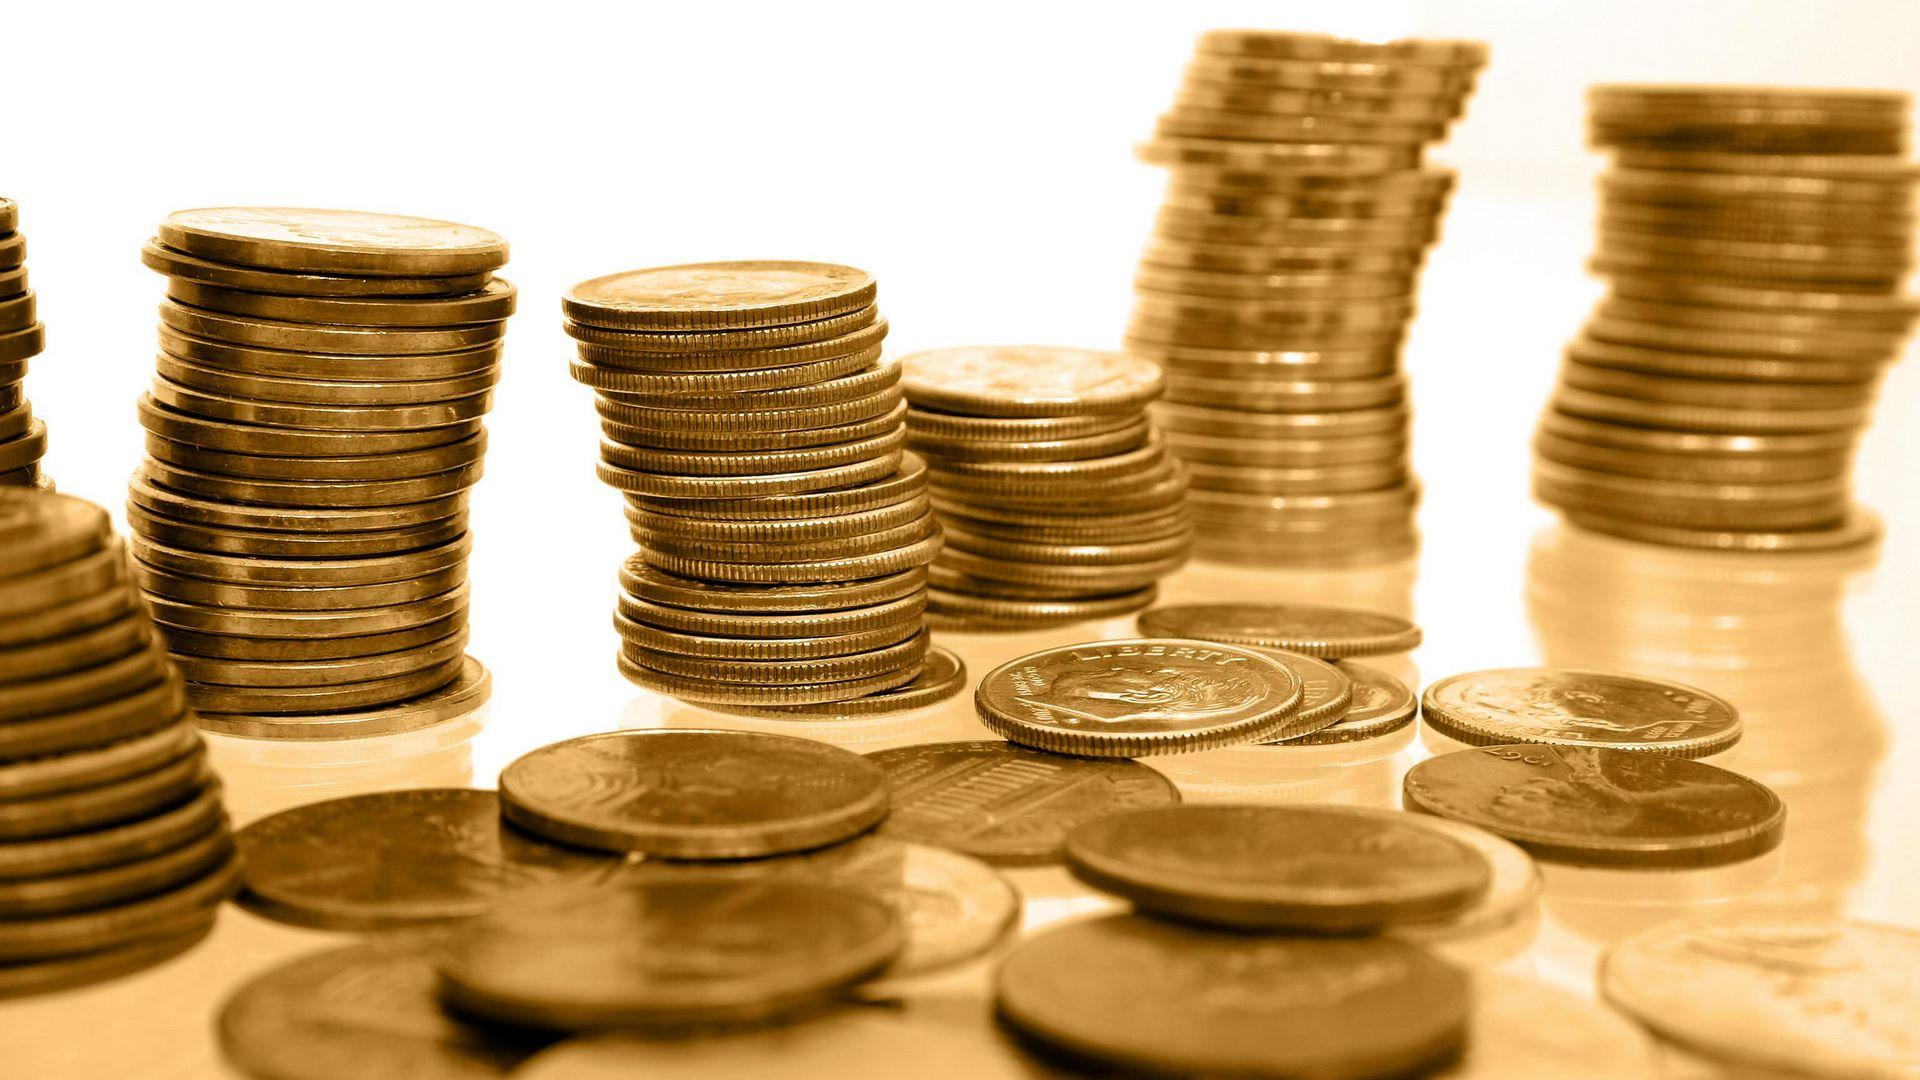 کاهش ۳۰۰ هزار تومانی حباب سکه